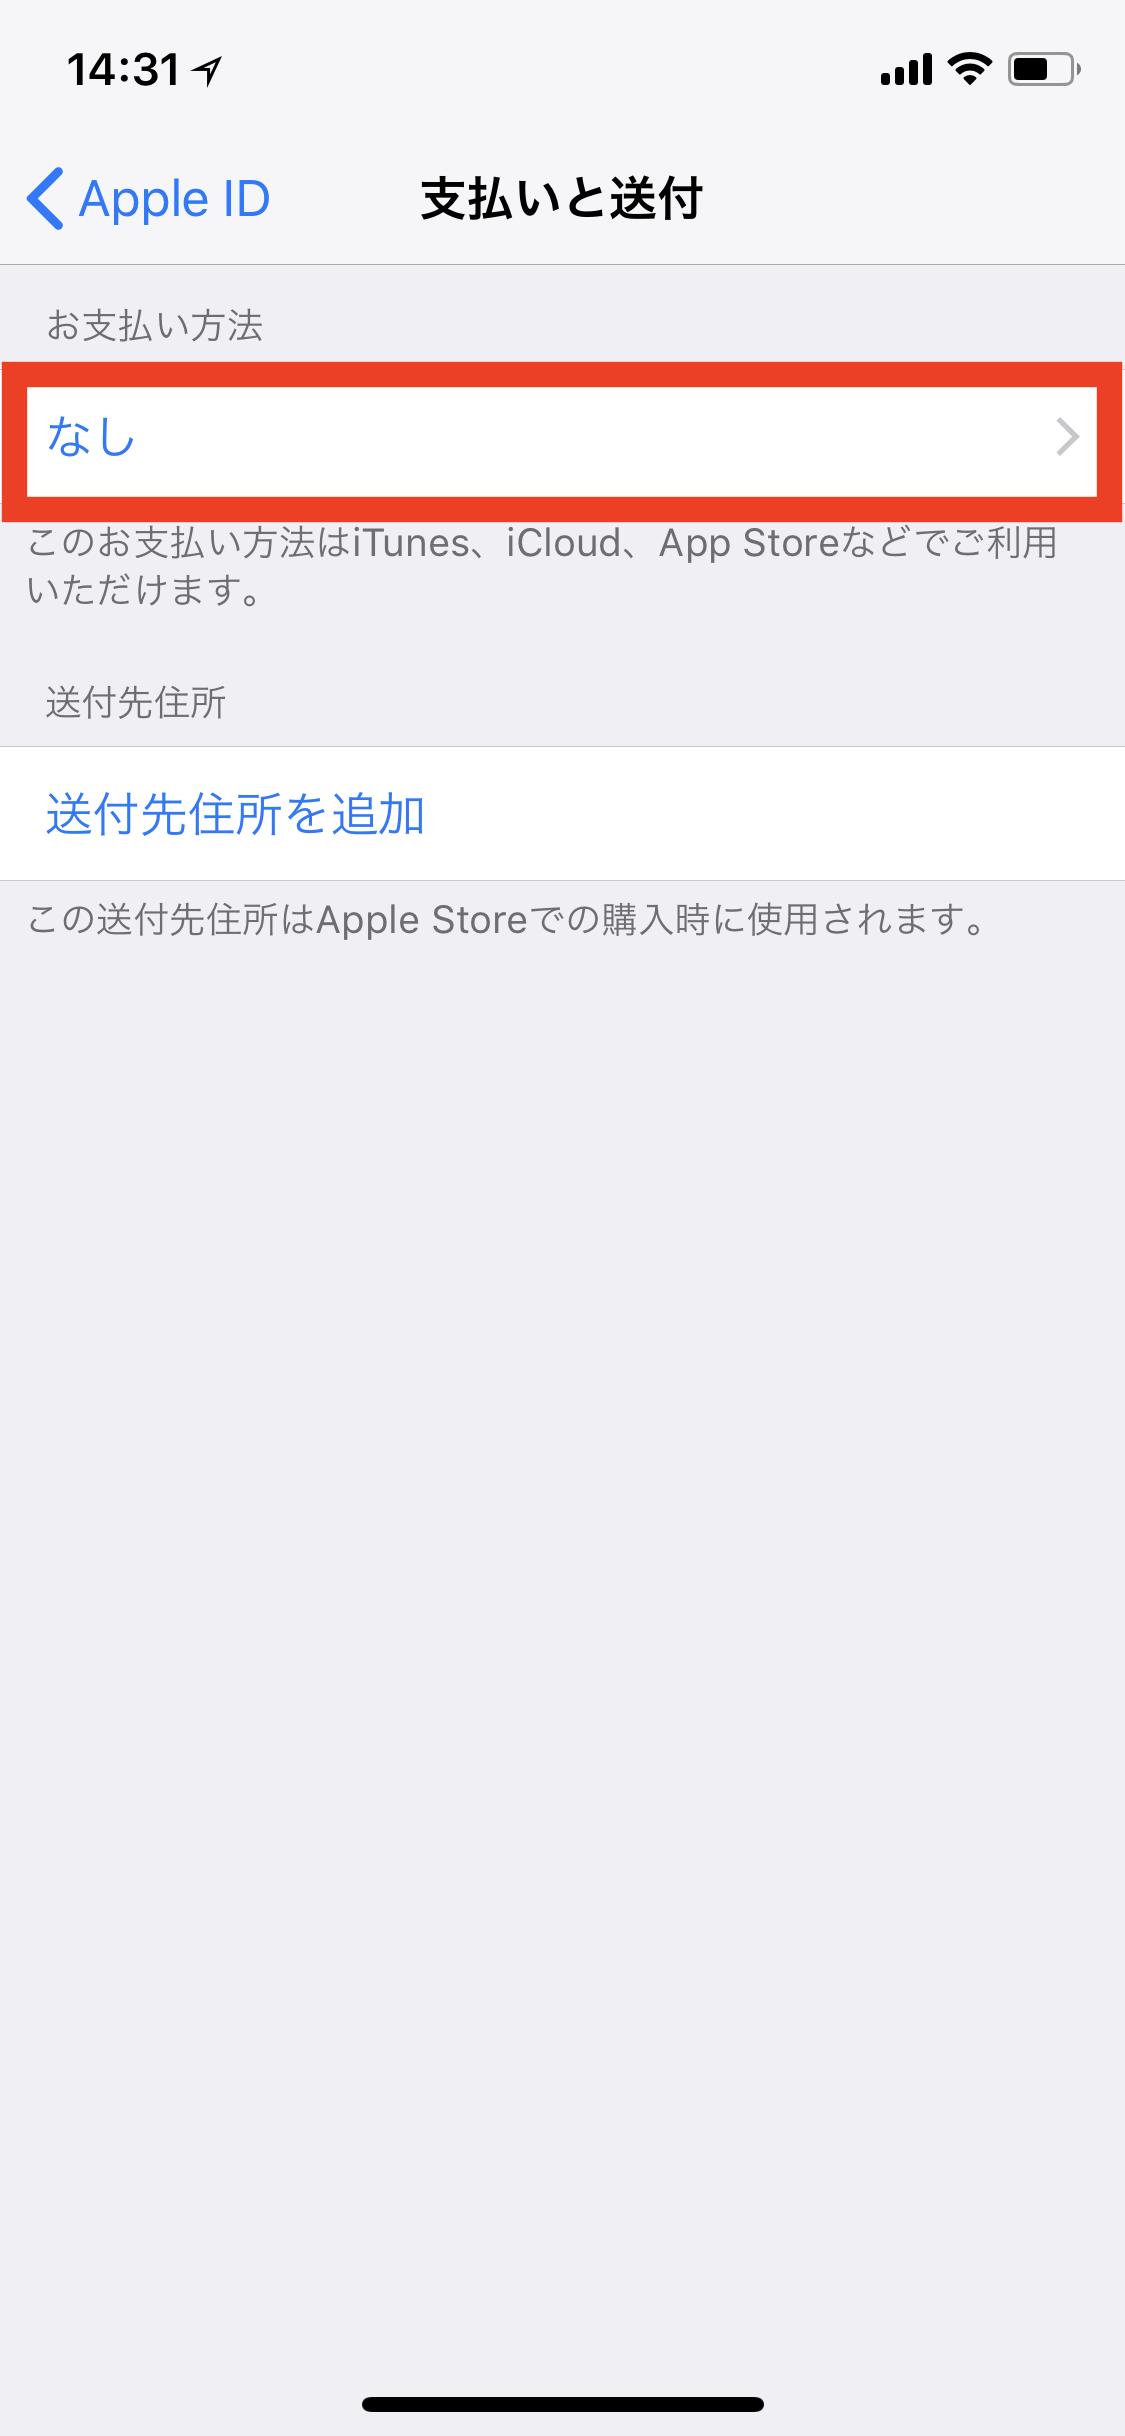 iPhone支払い方法